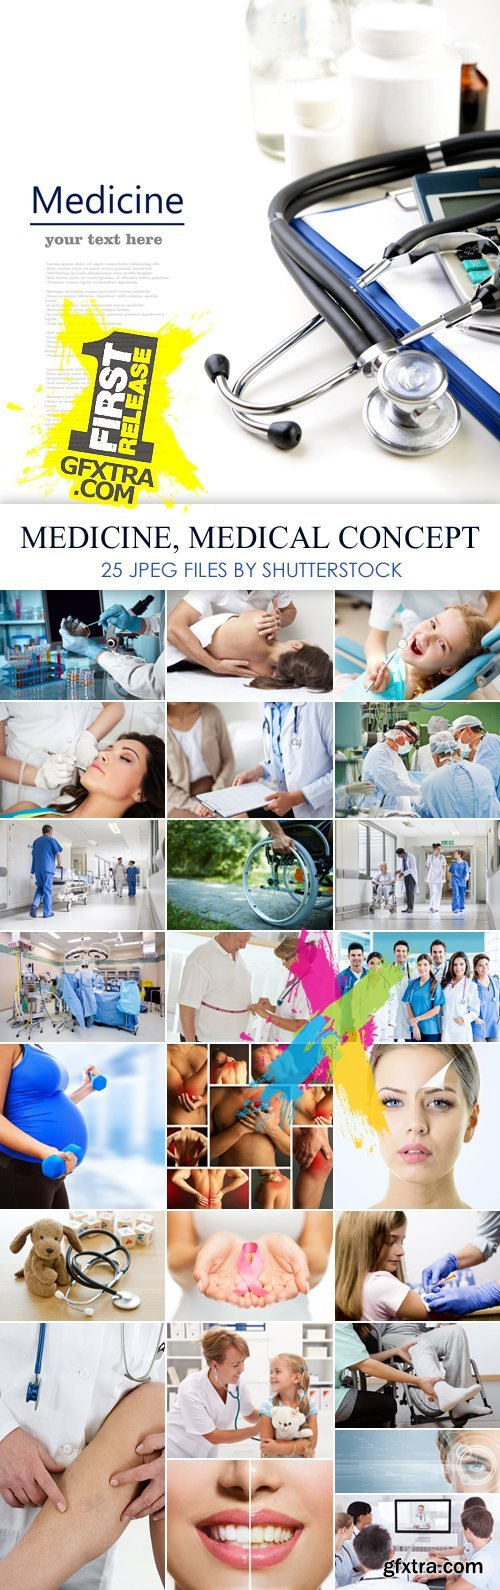 Stock Photo - Medicine, Medical Concept